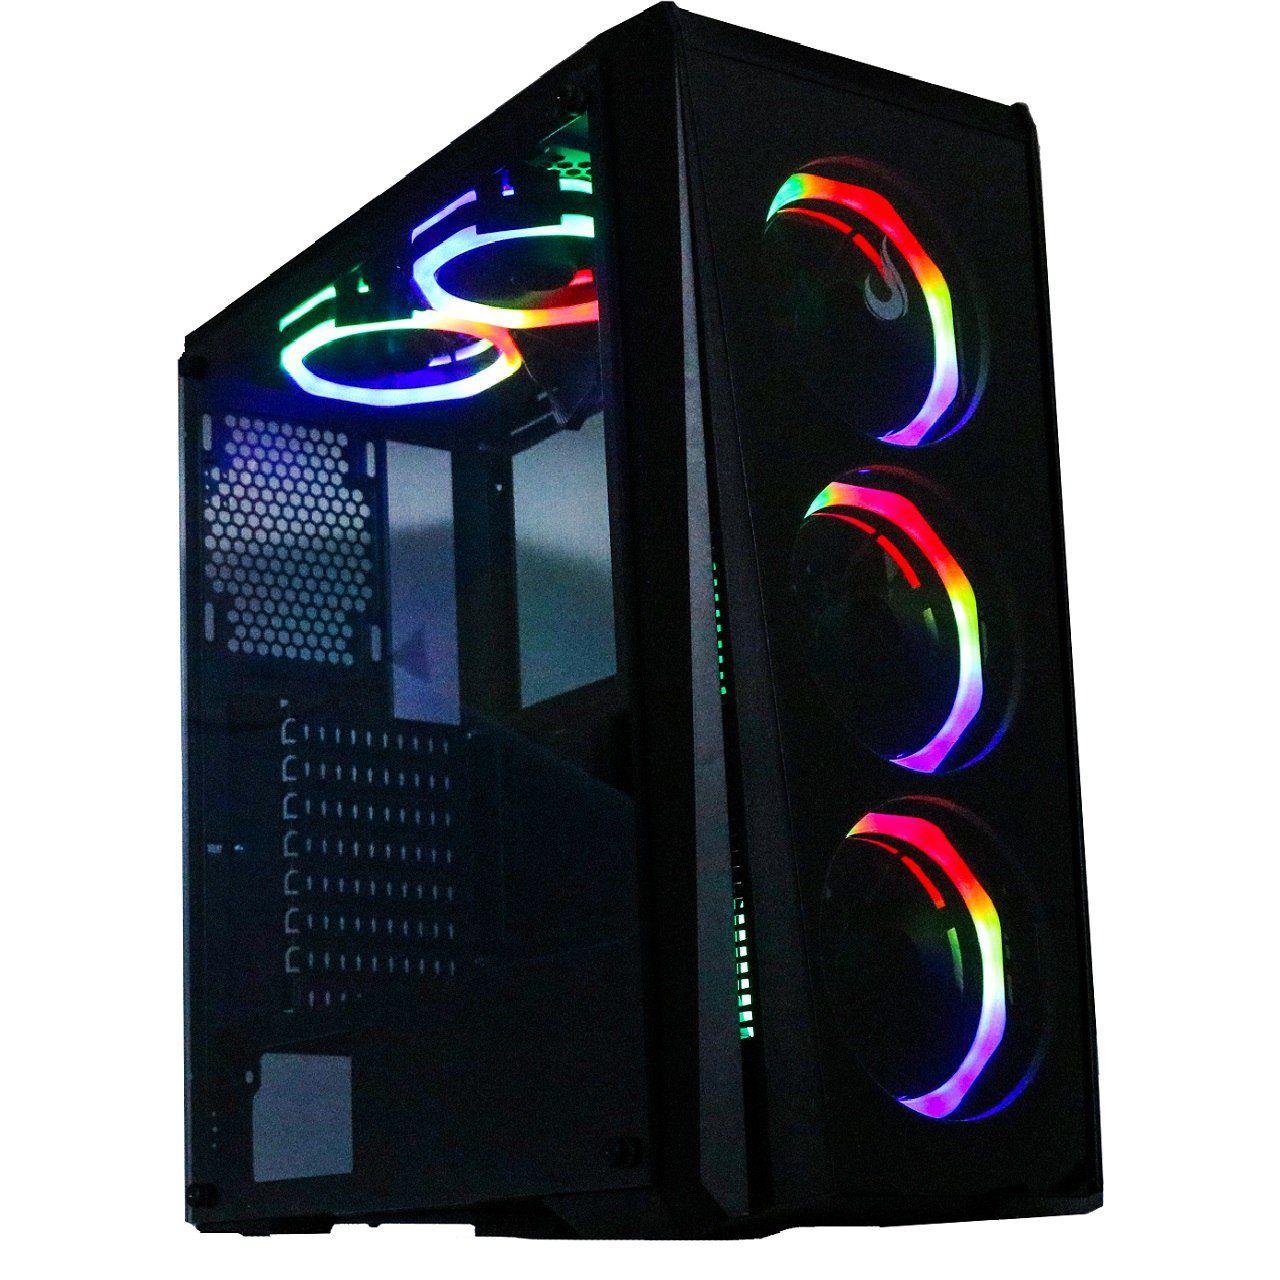 GABINETE GAMER RISE MODE GLASS 04 - RGB 8 fans  - Loja Rise Mode